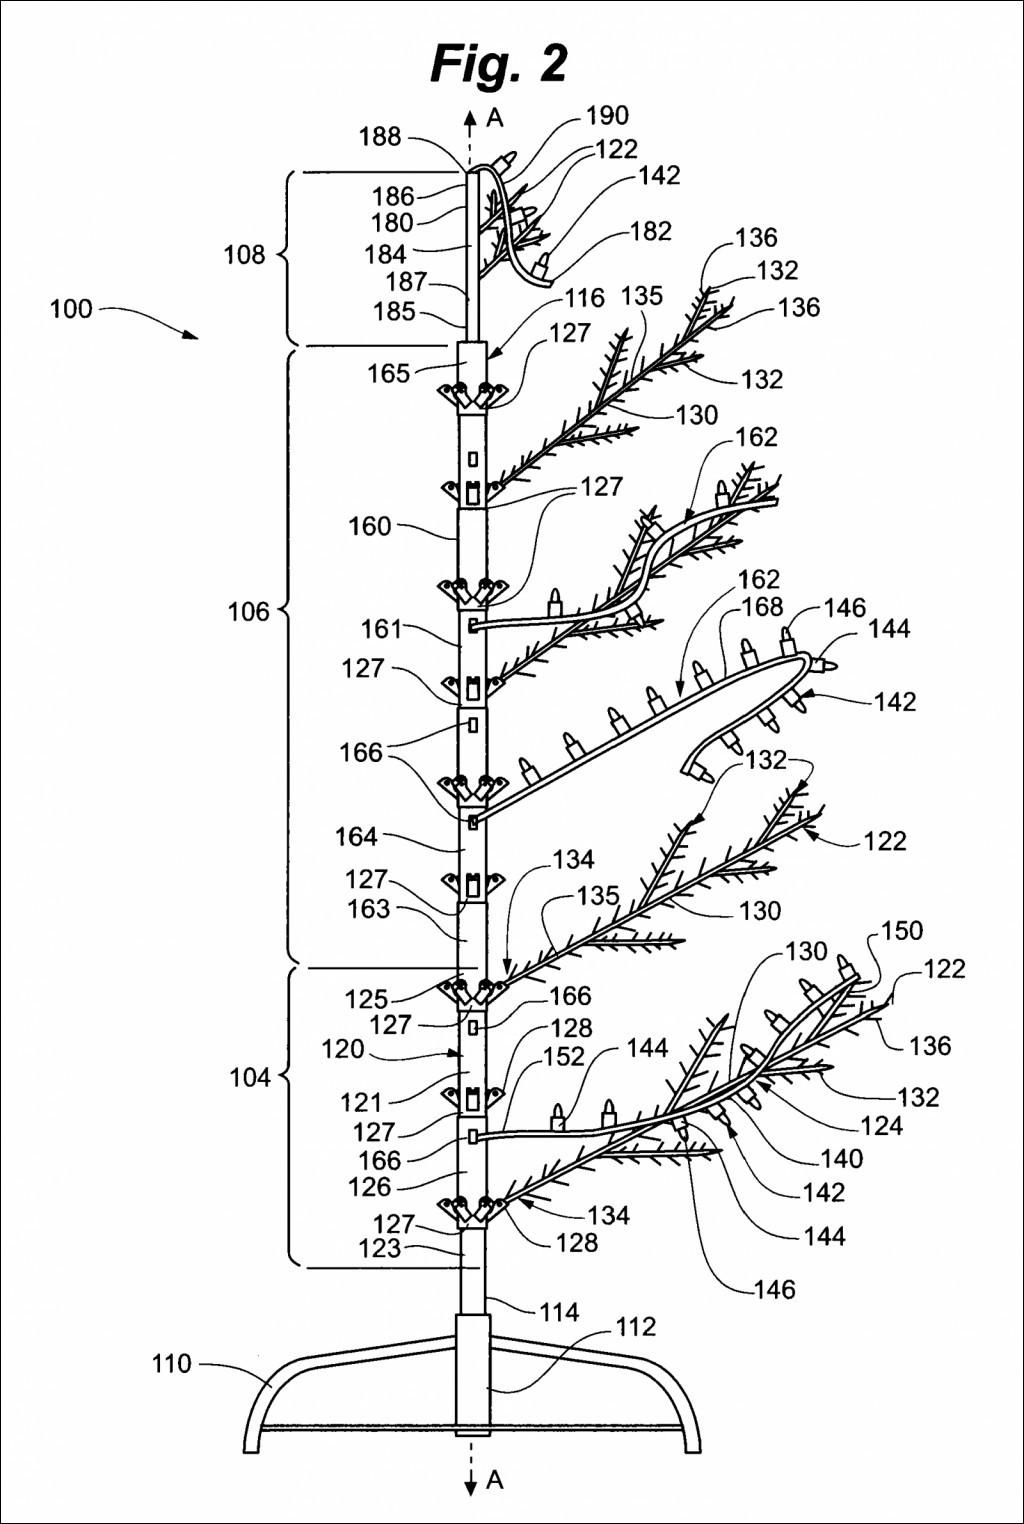 perfect christmas tree light circuit diagram wiring diagram page pre lit christmas tree wiring diagram with light circuit diagram